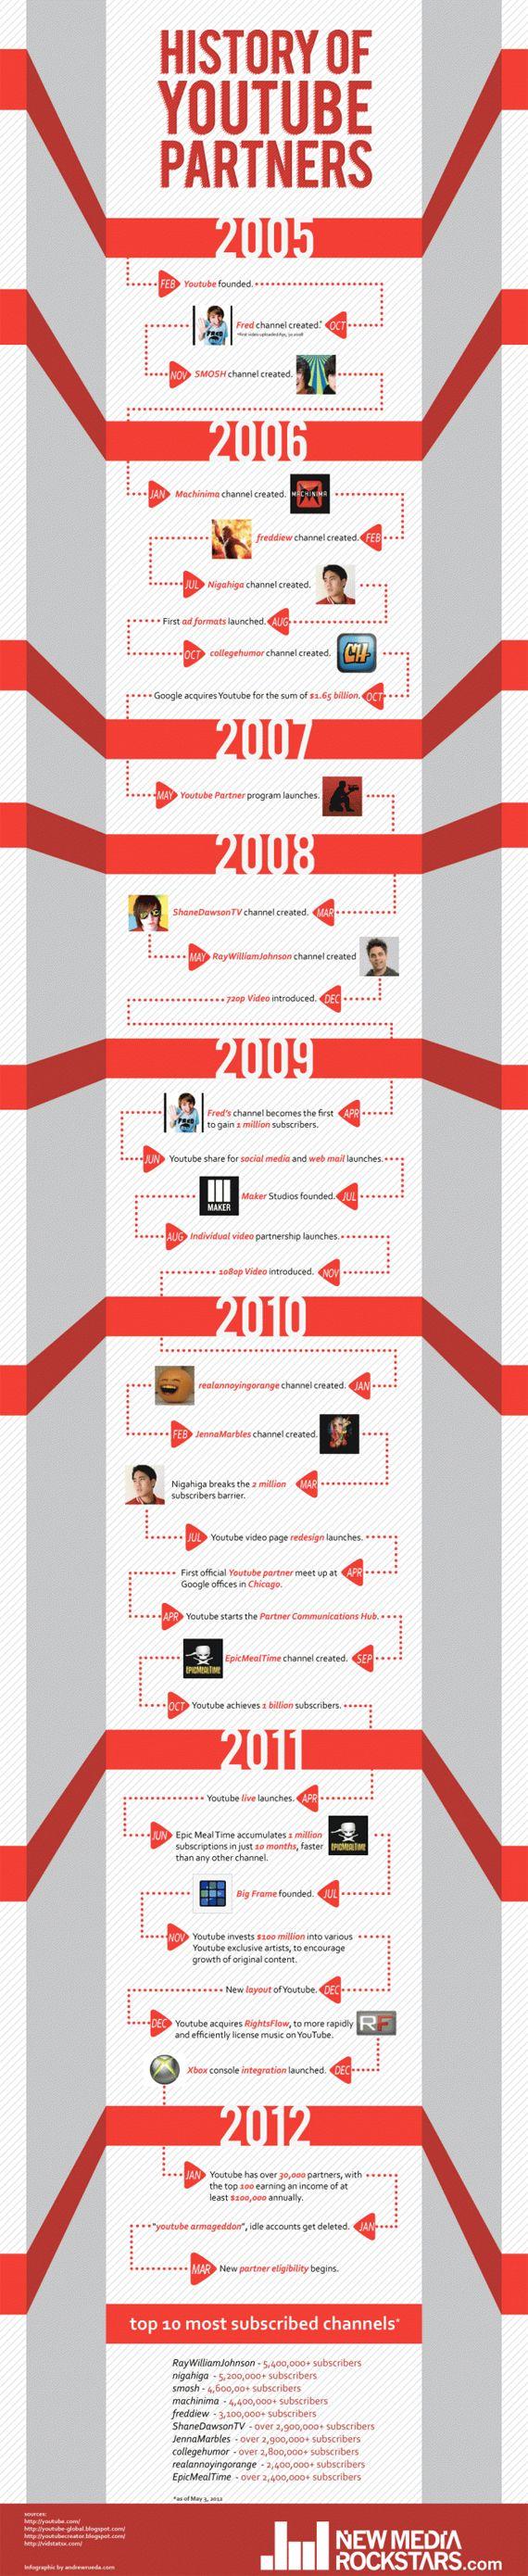 History Of YouTube Partners